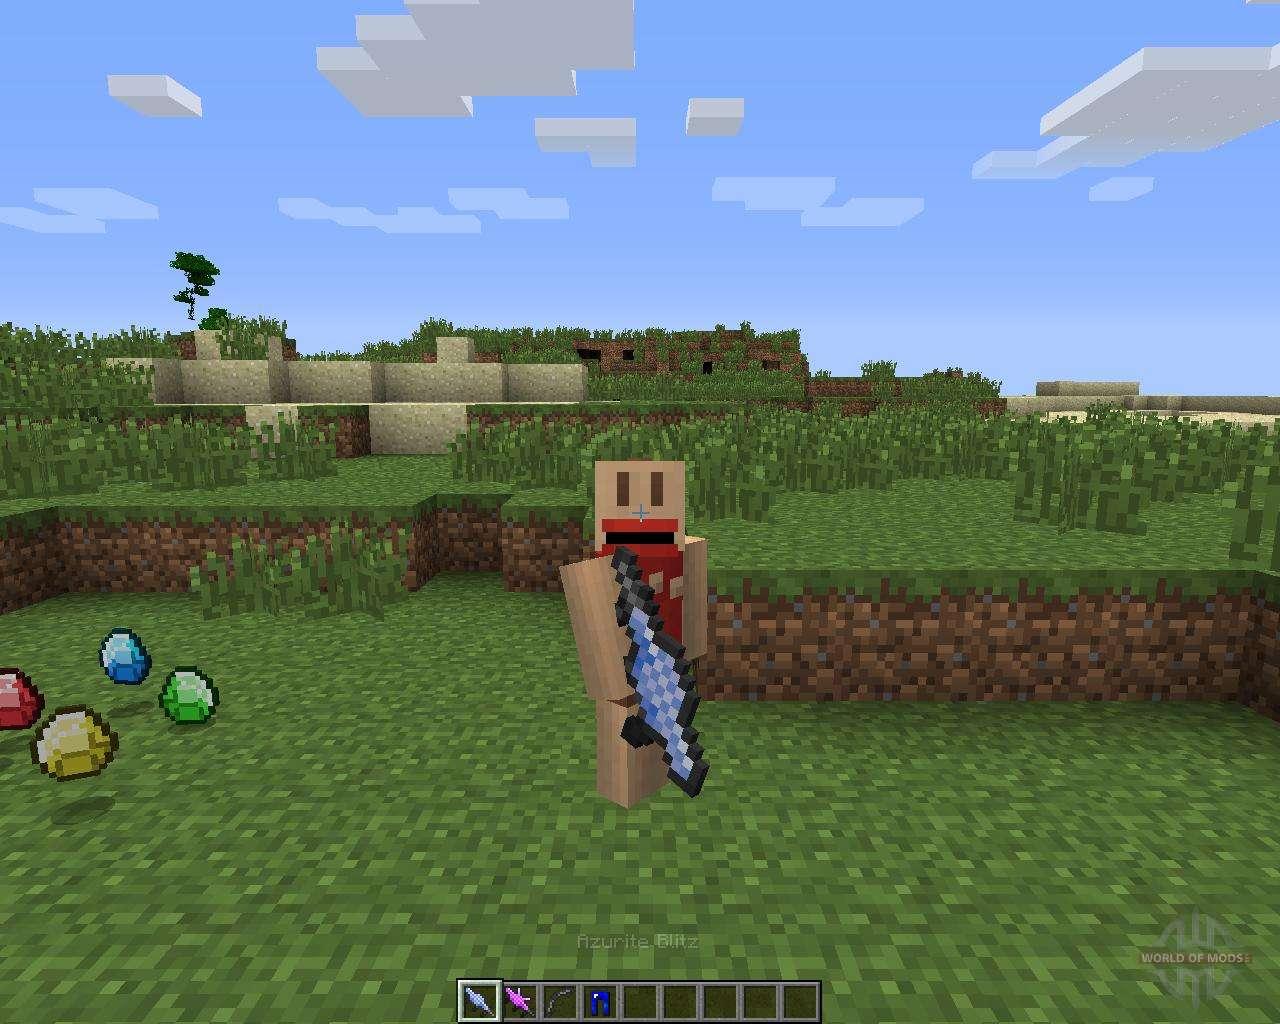 Скачать Divine RPG мод Minecraft [1.6.4]